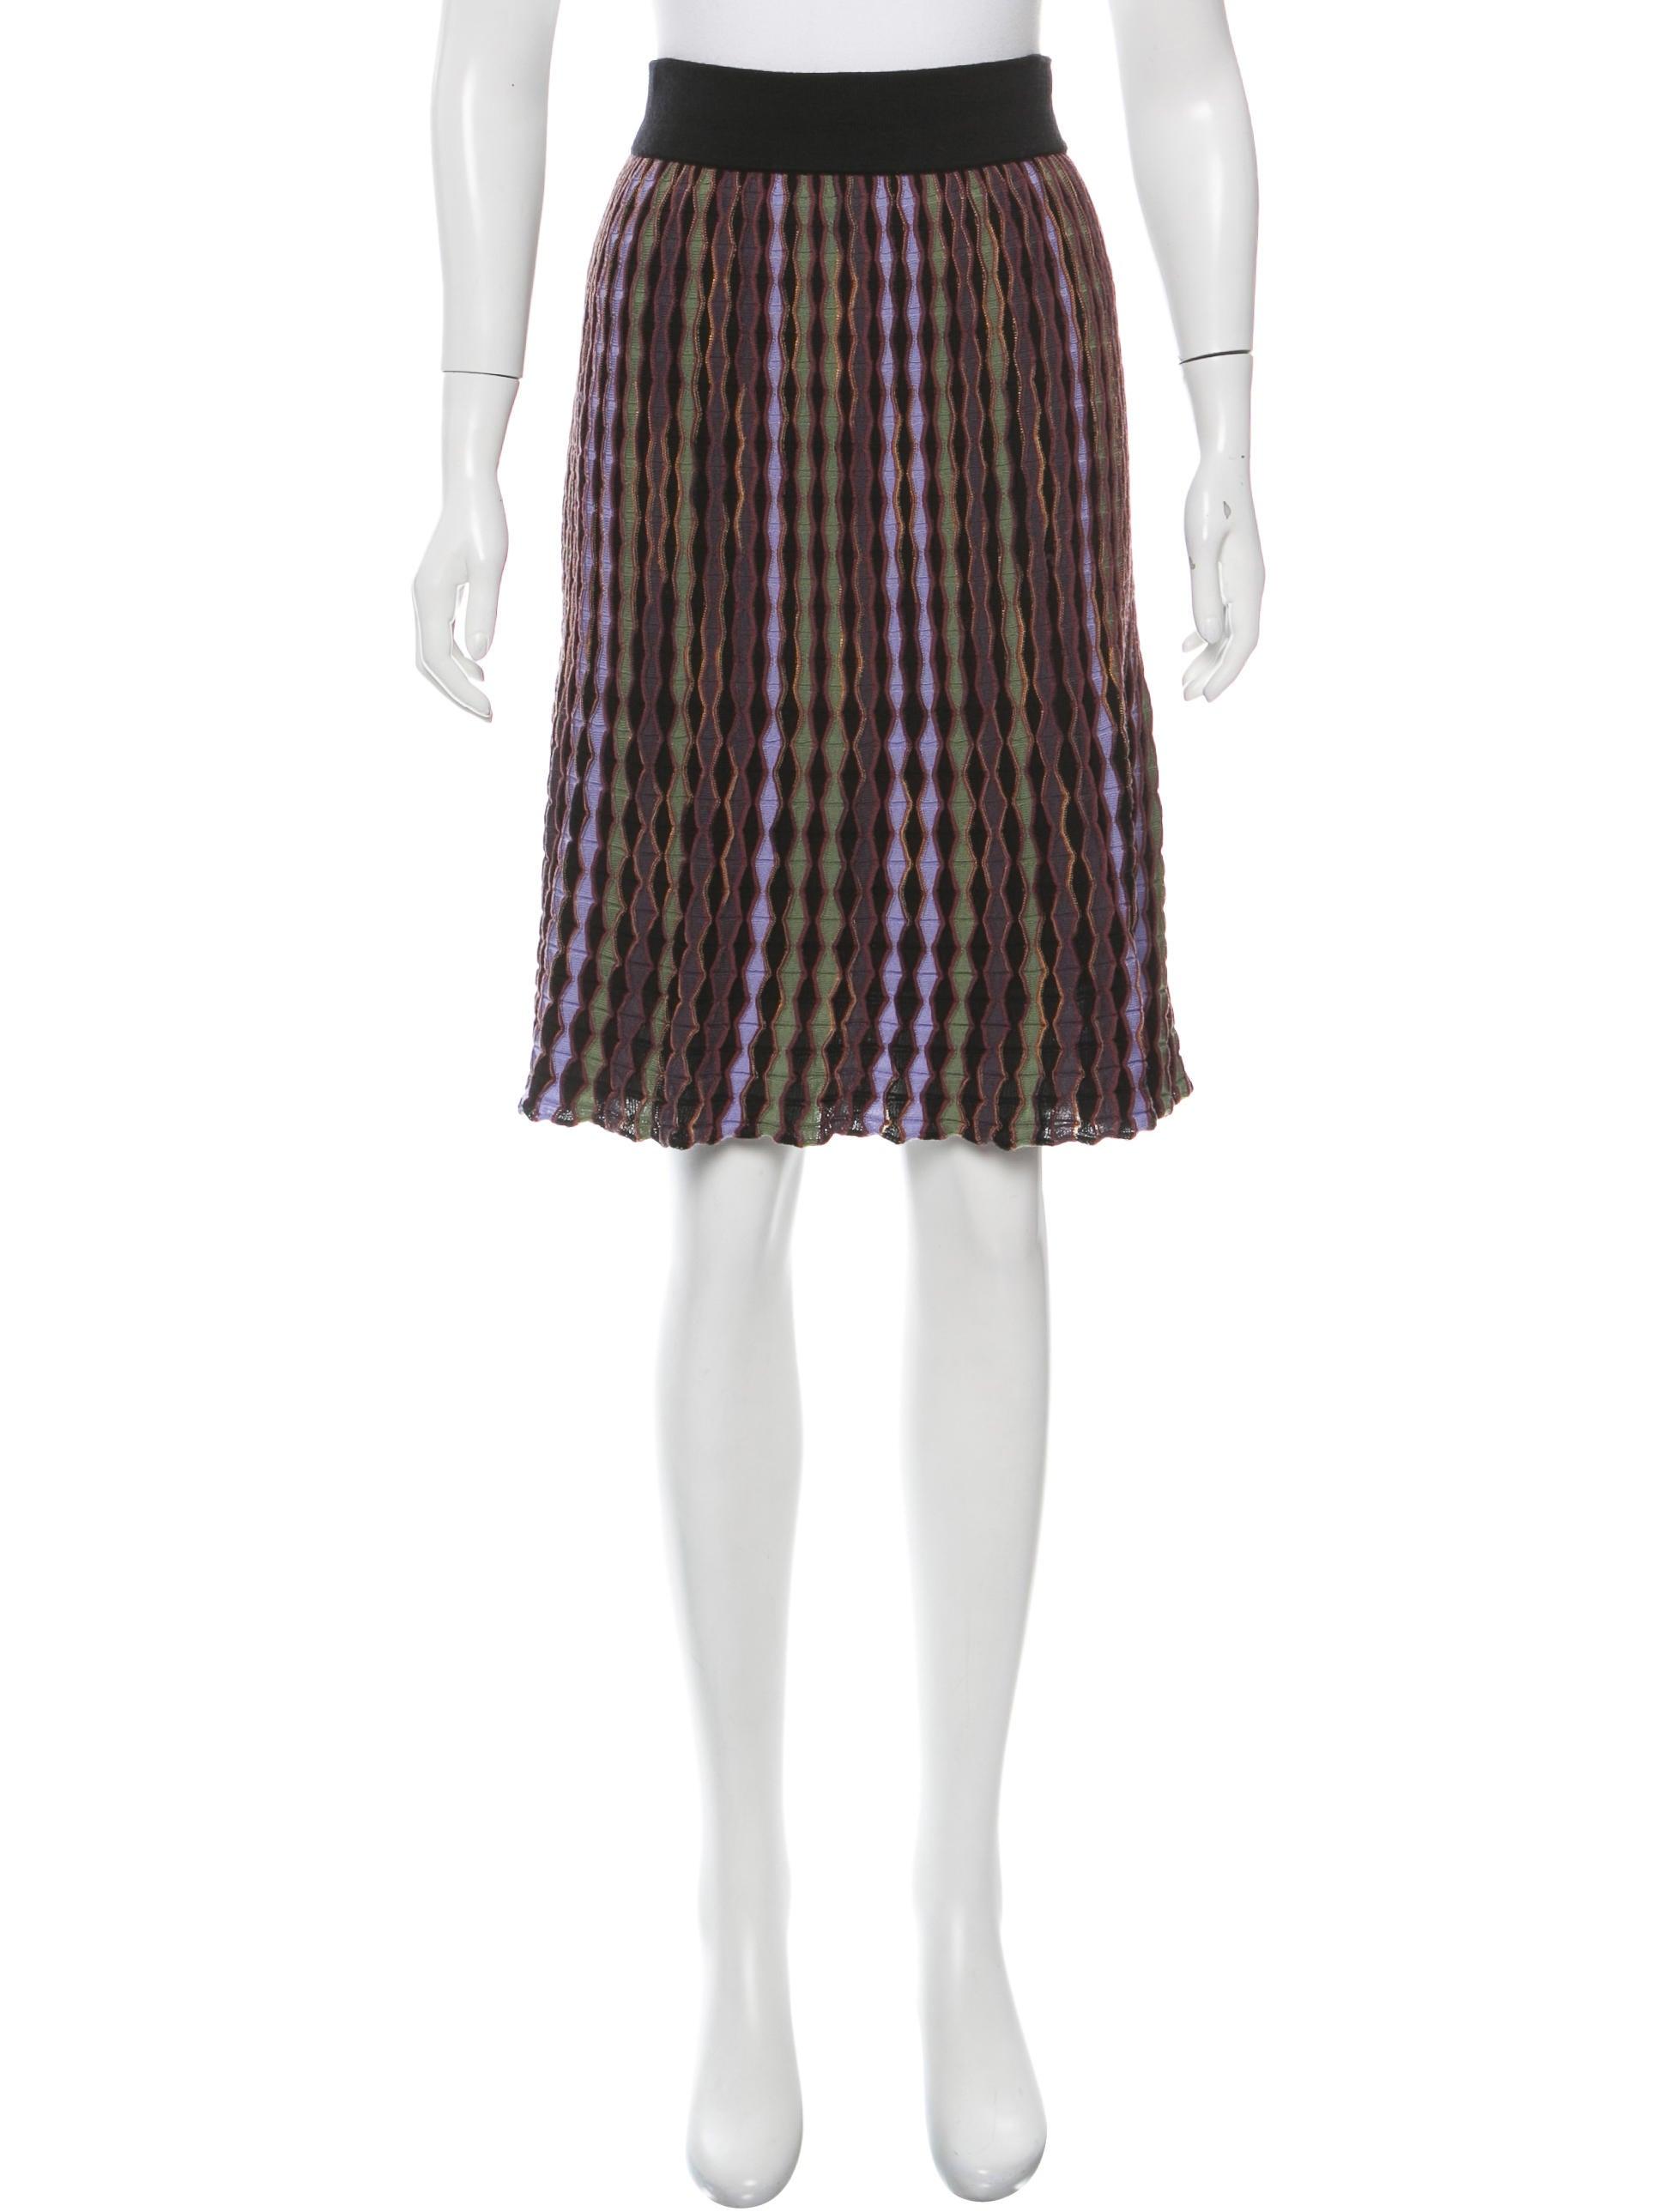 Knitting Skirt Tutorial : M missoni knit pattern skirt clothing wm the